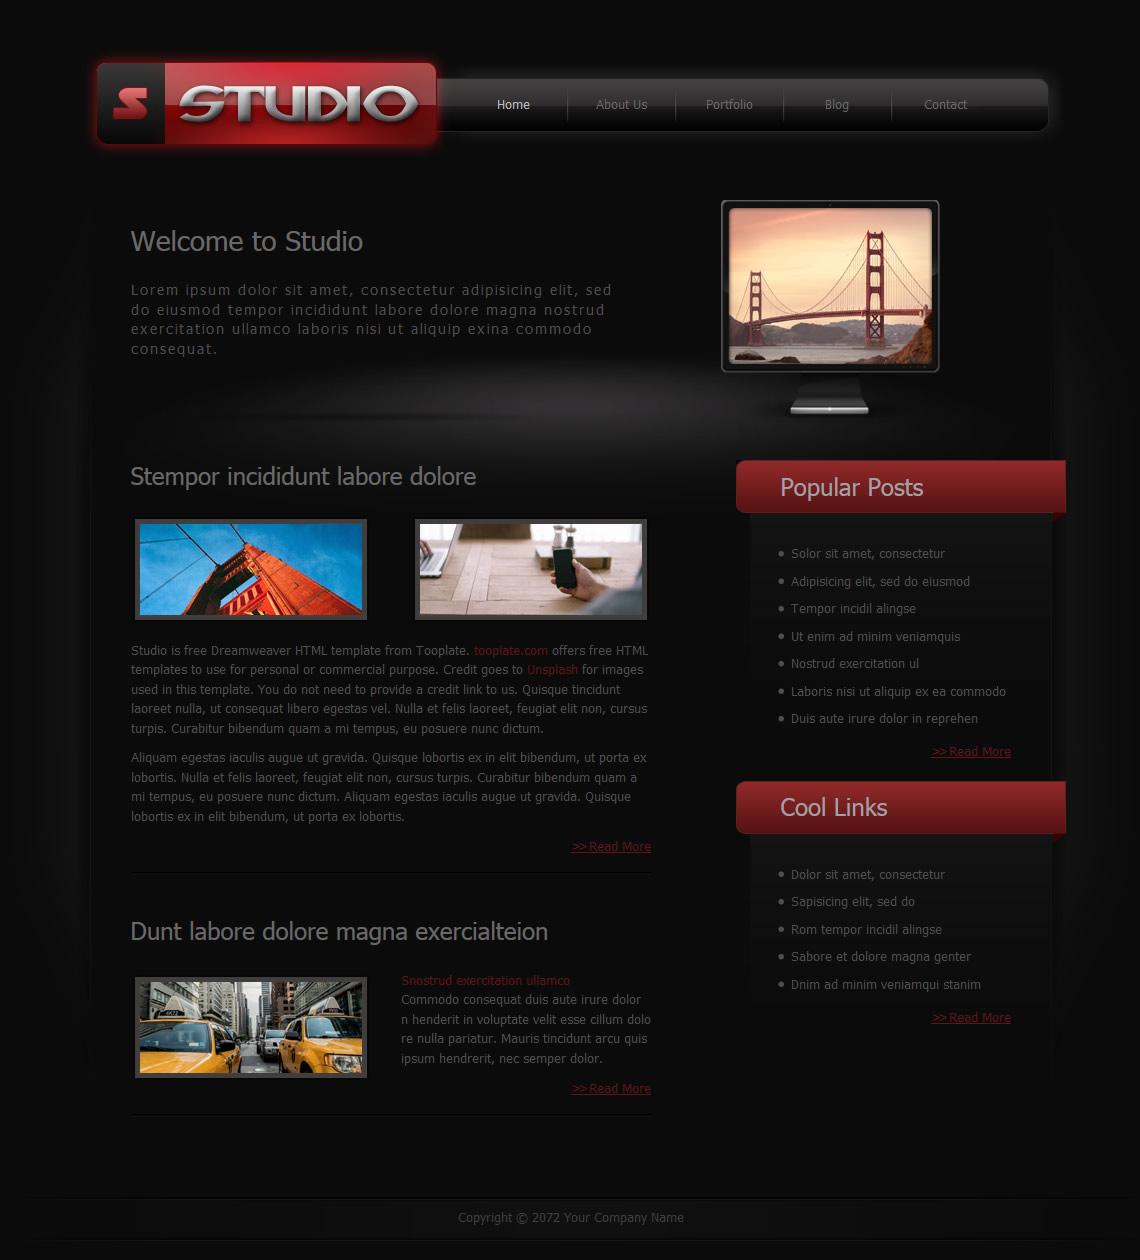 Studio free templates live view screenshot download maxwellsz